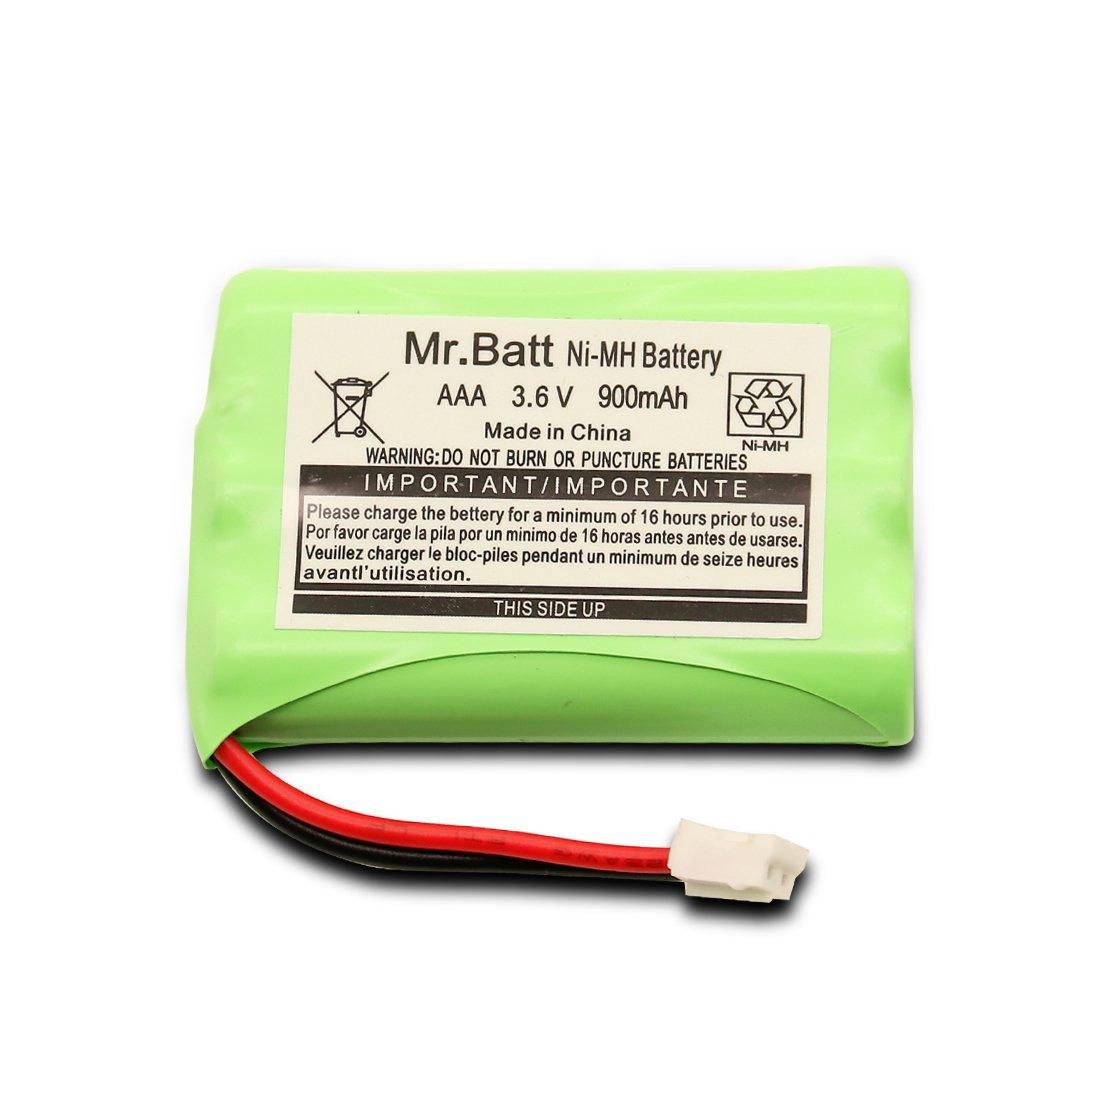 Mr.Batt 900mAh Replacement Battery for Motorola Baby Monitor MBP33 MBP33S MBP33PU MBP36 MBP36S MBP36PU